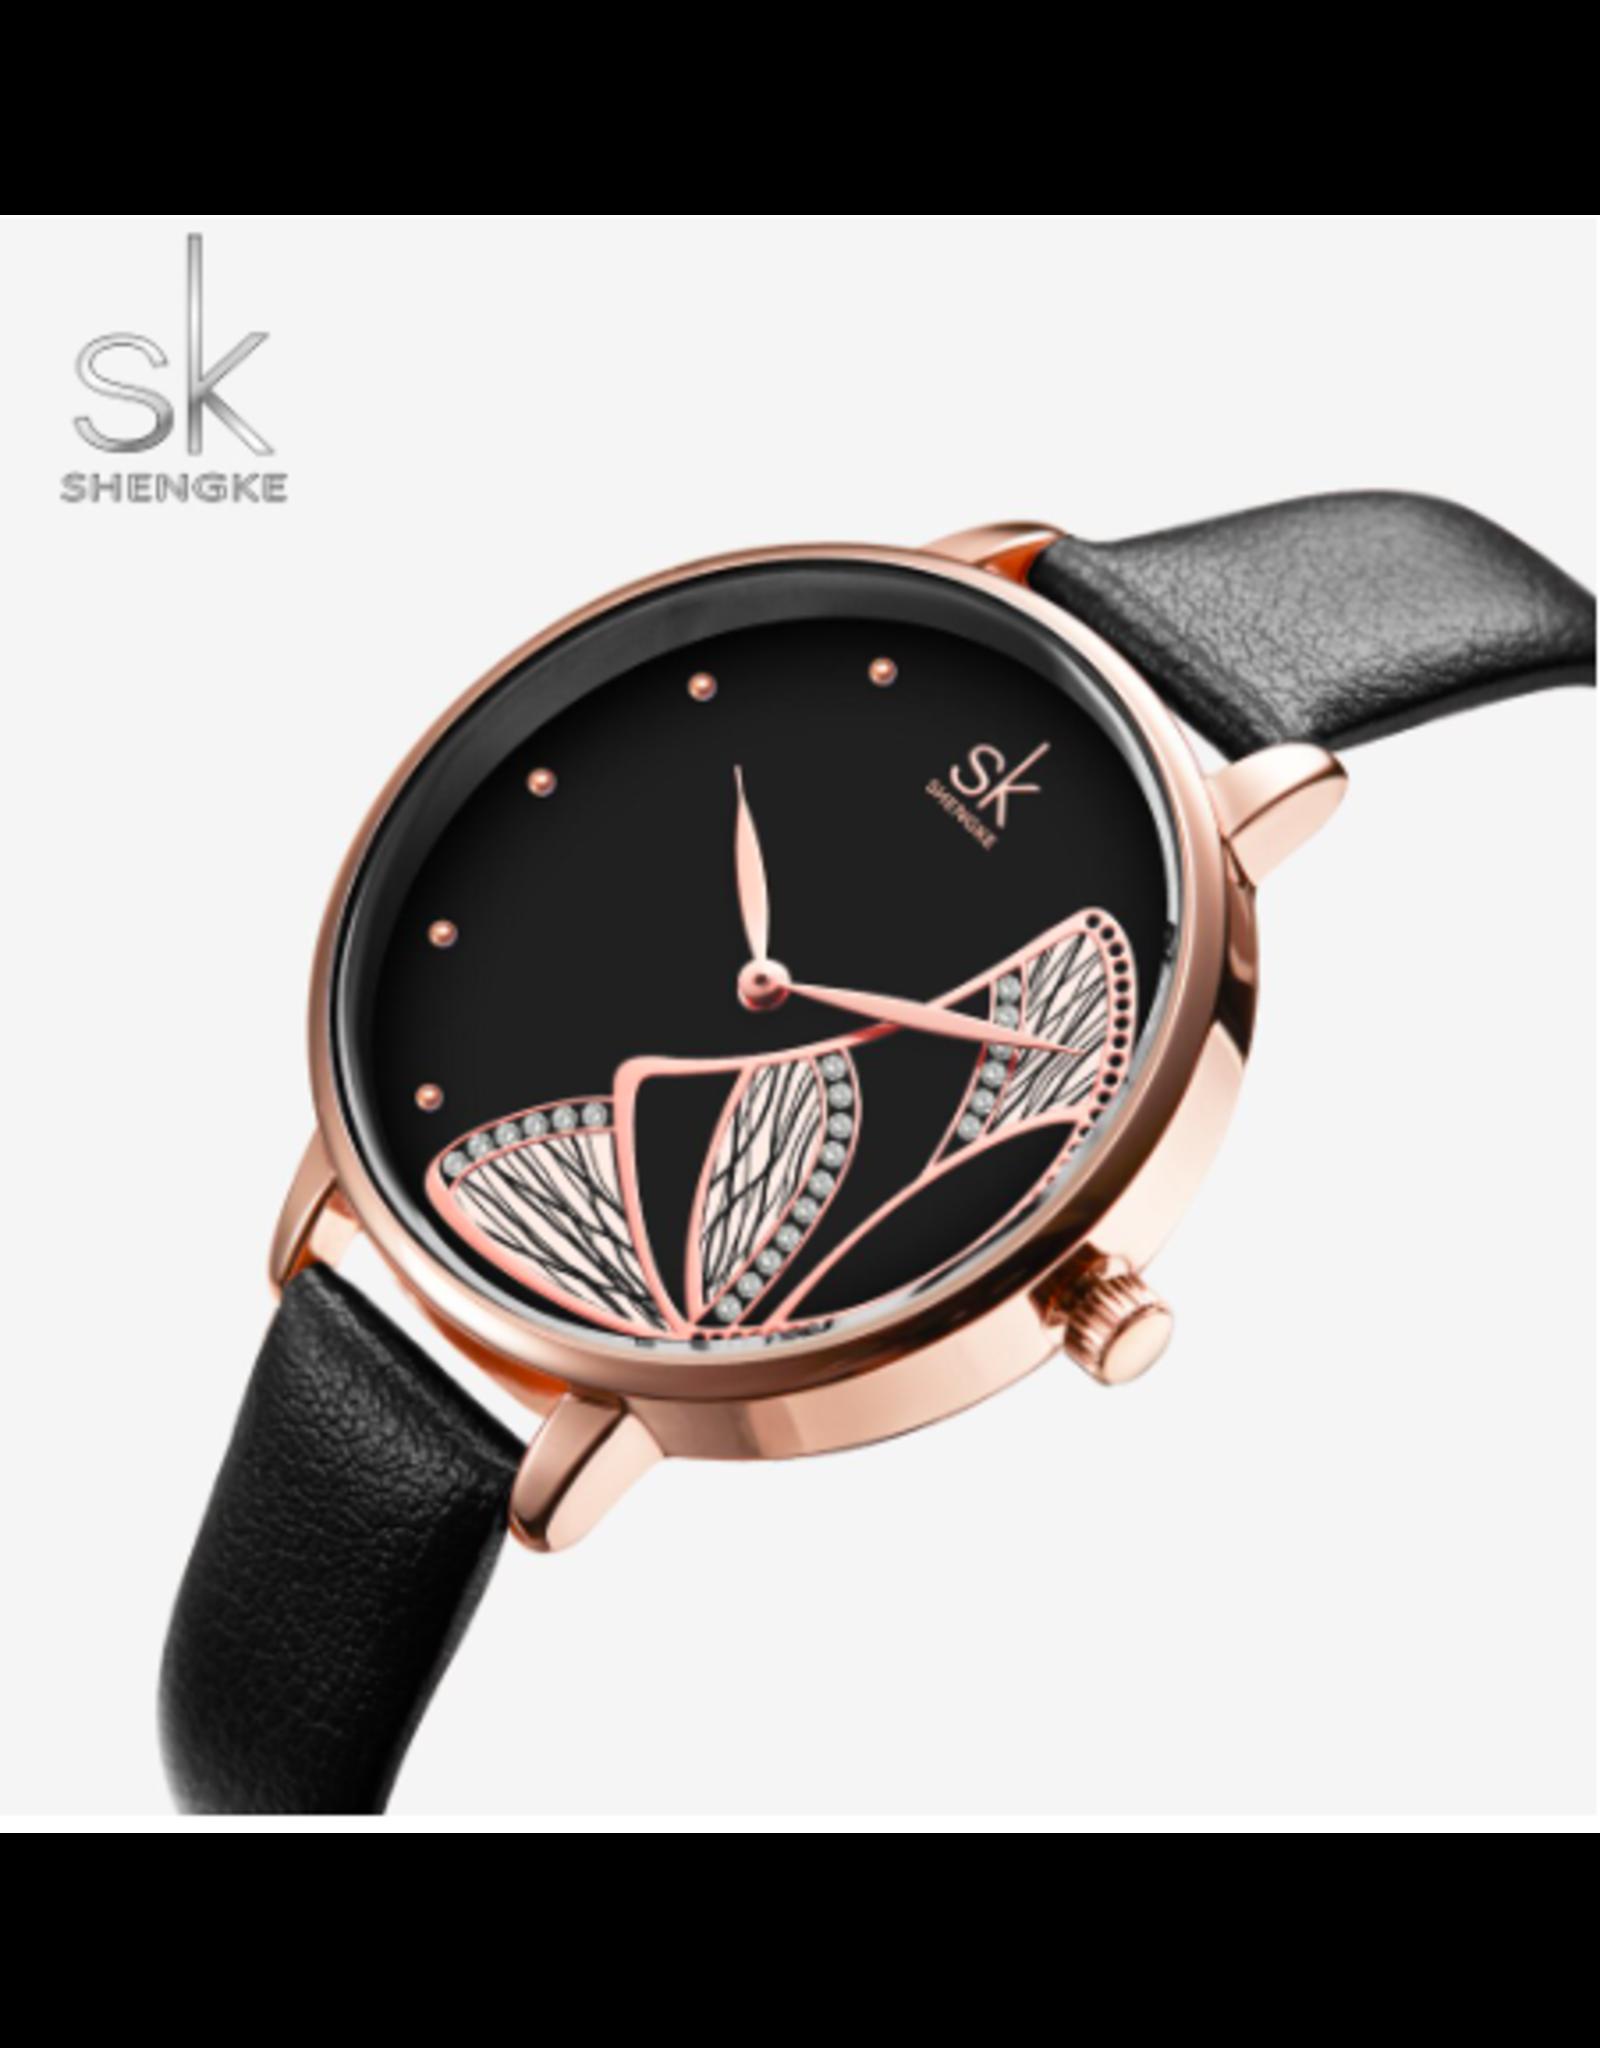 Shengke Shengke Cuir Noir Papillon